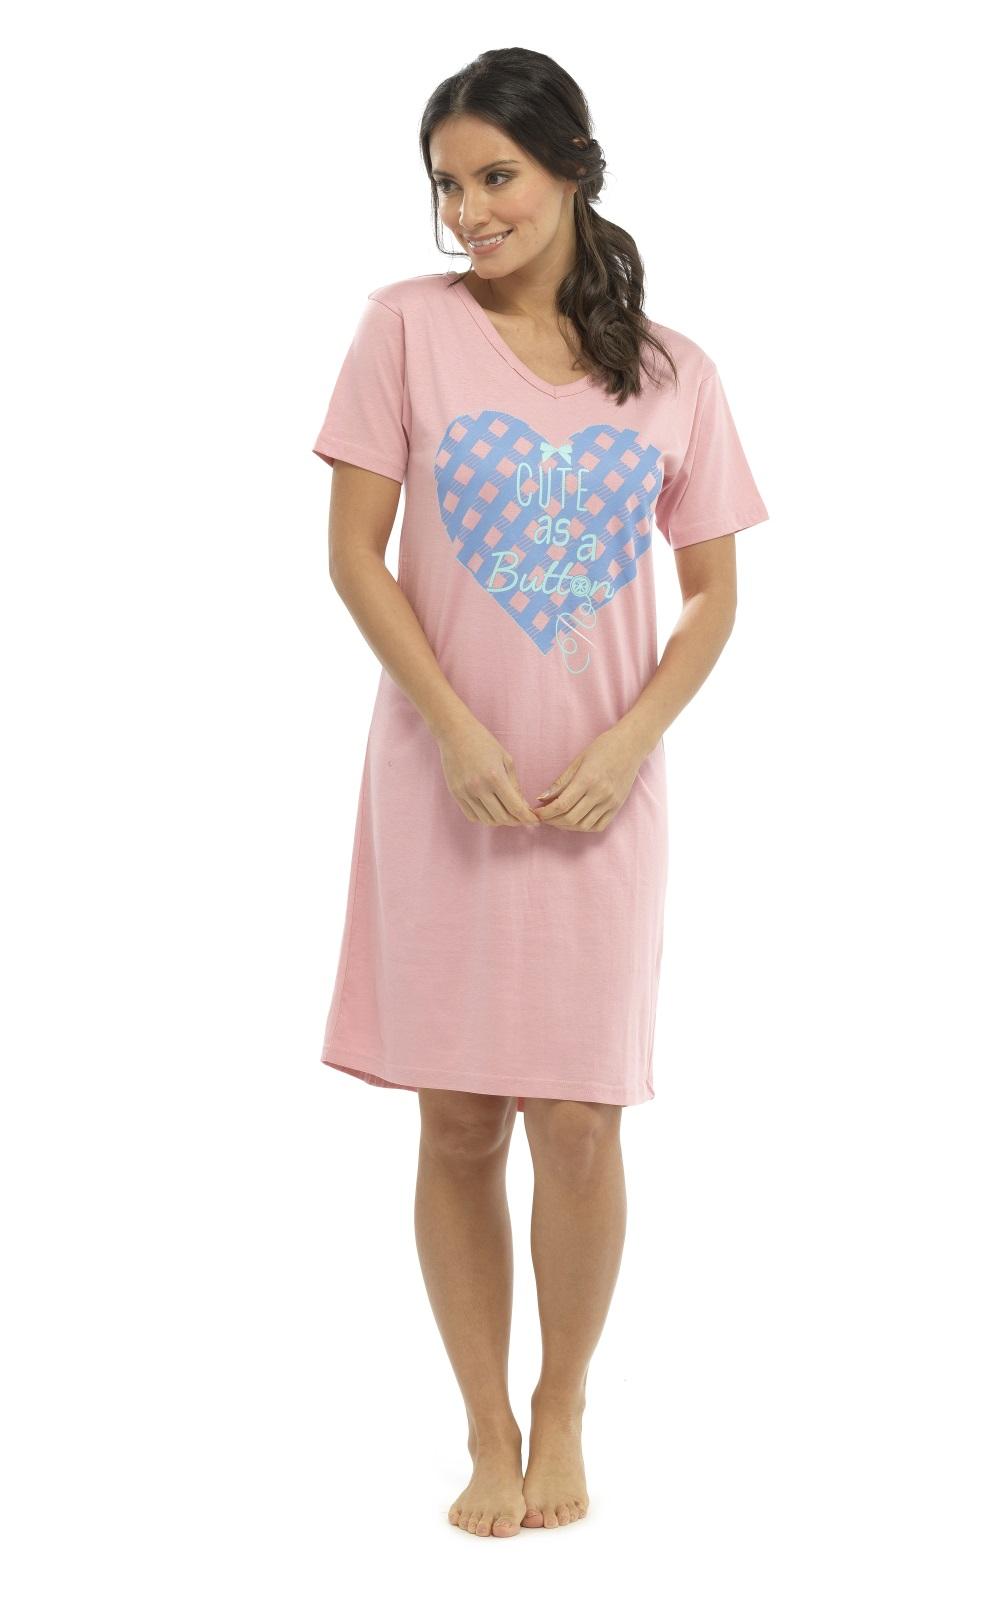 Womens long short sleeve nightdress t shirt slogan for Short sleeve t shirts with longer sleeves